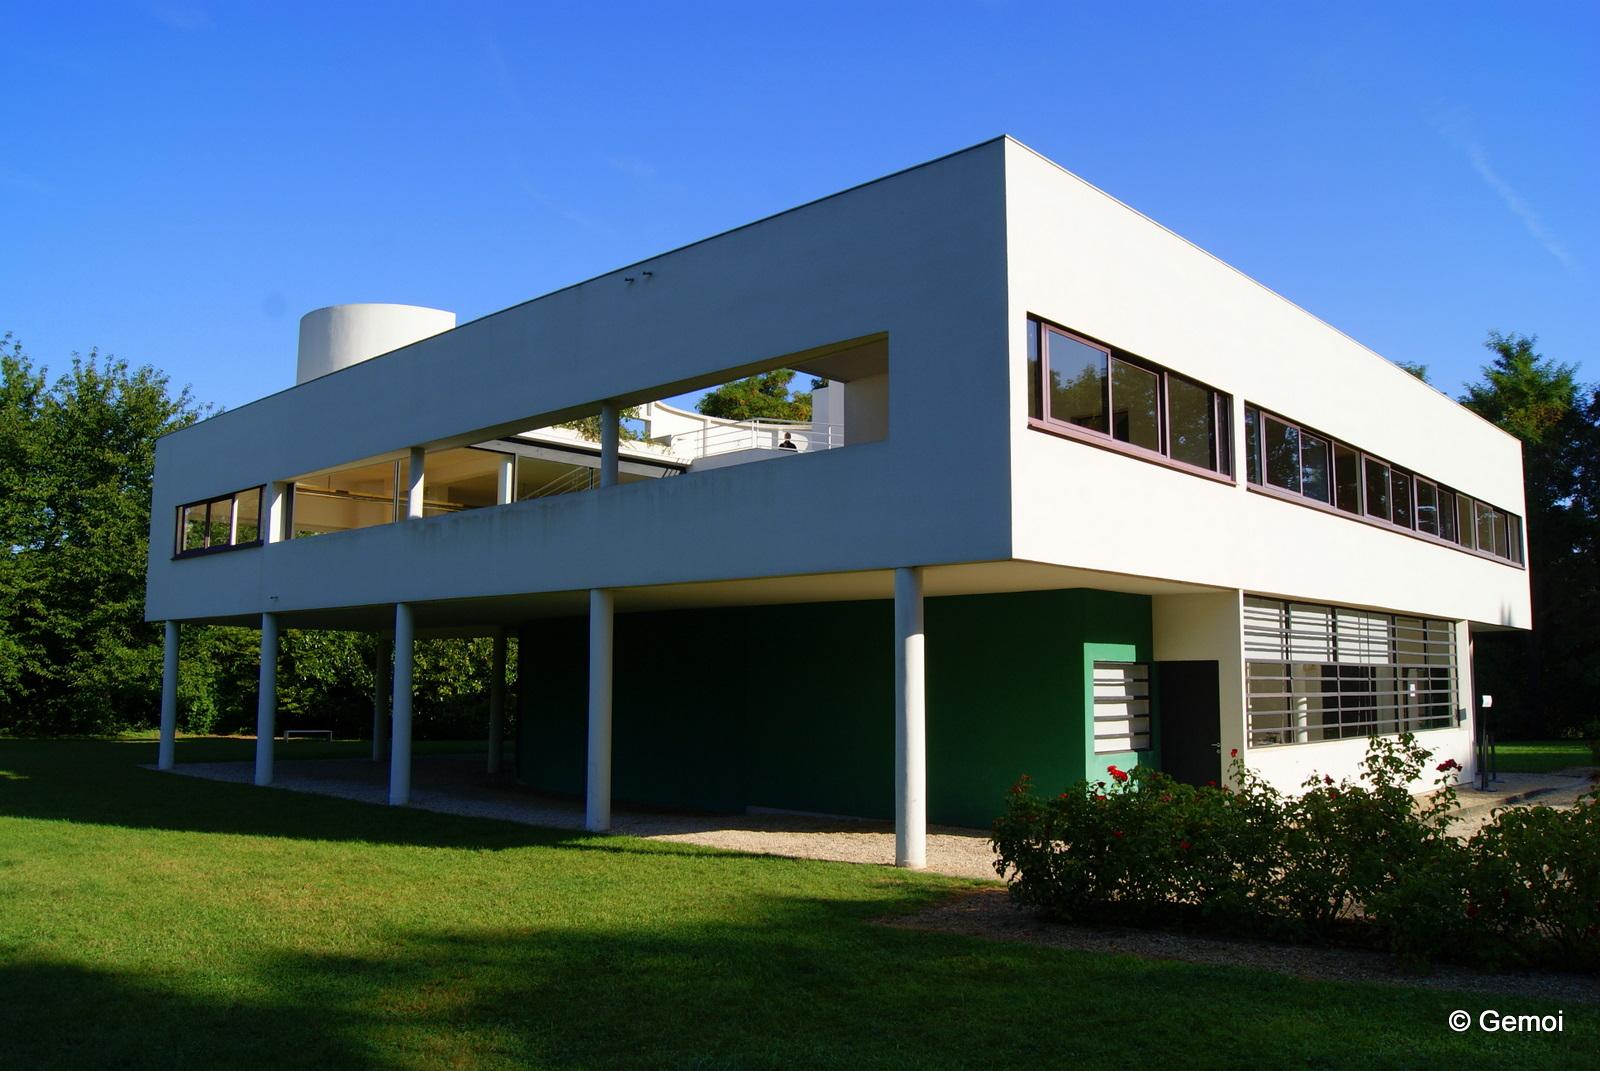 Mahamuni 39 s blog la villa savoye 1929 poissy cinq for Architecture de villa moderne